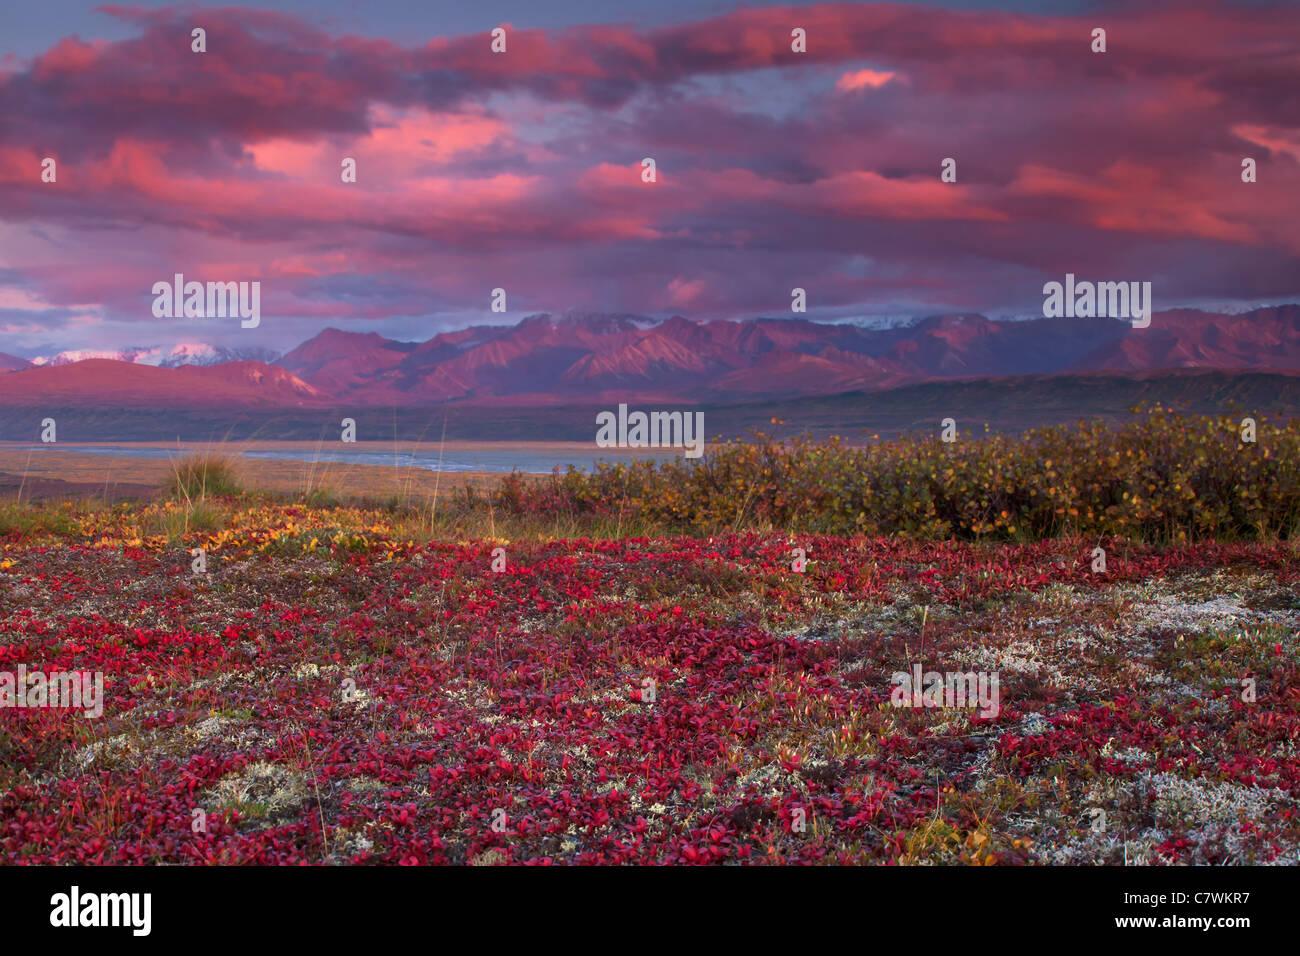 Mt. McKinley o Denali, el Parque Nacional Denali, Alaska. Imagen De Stock